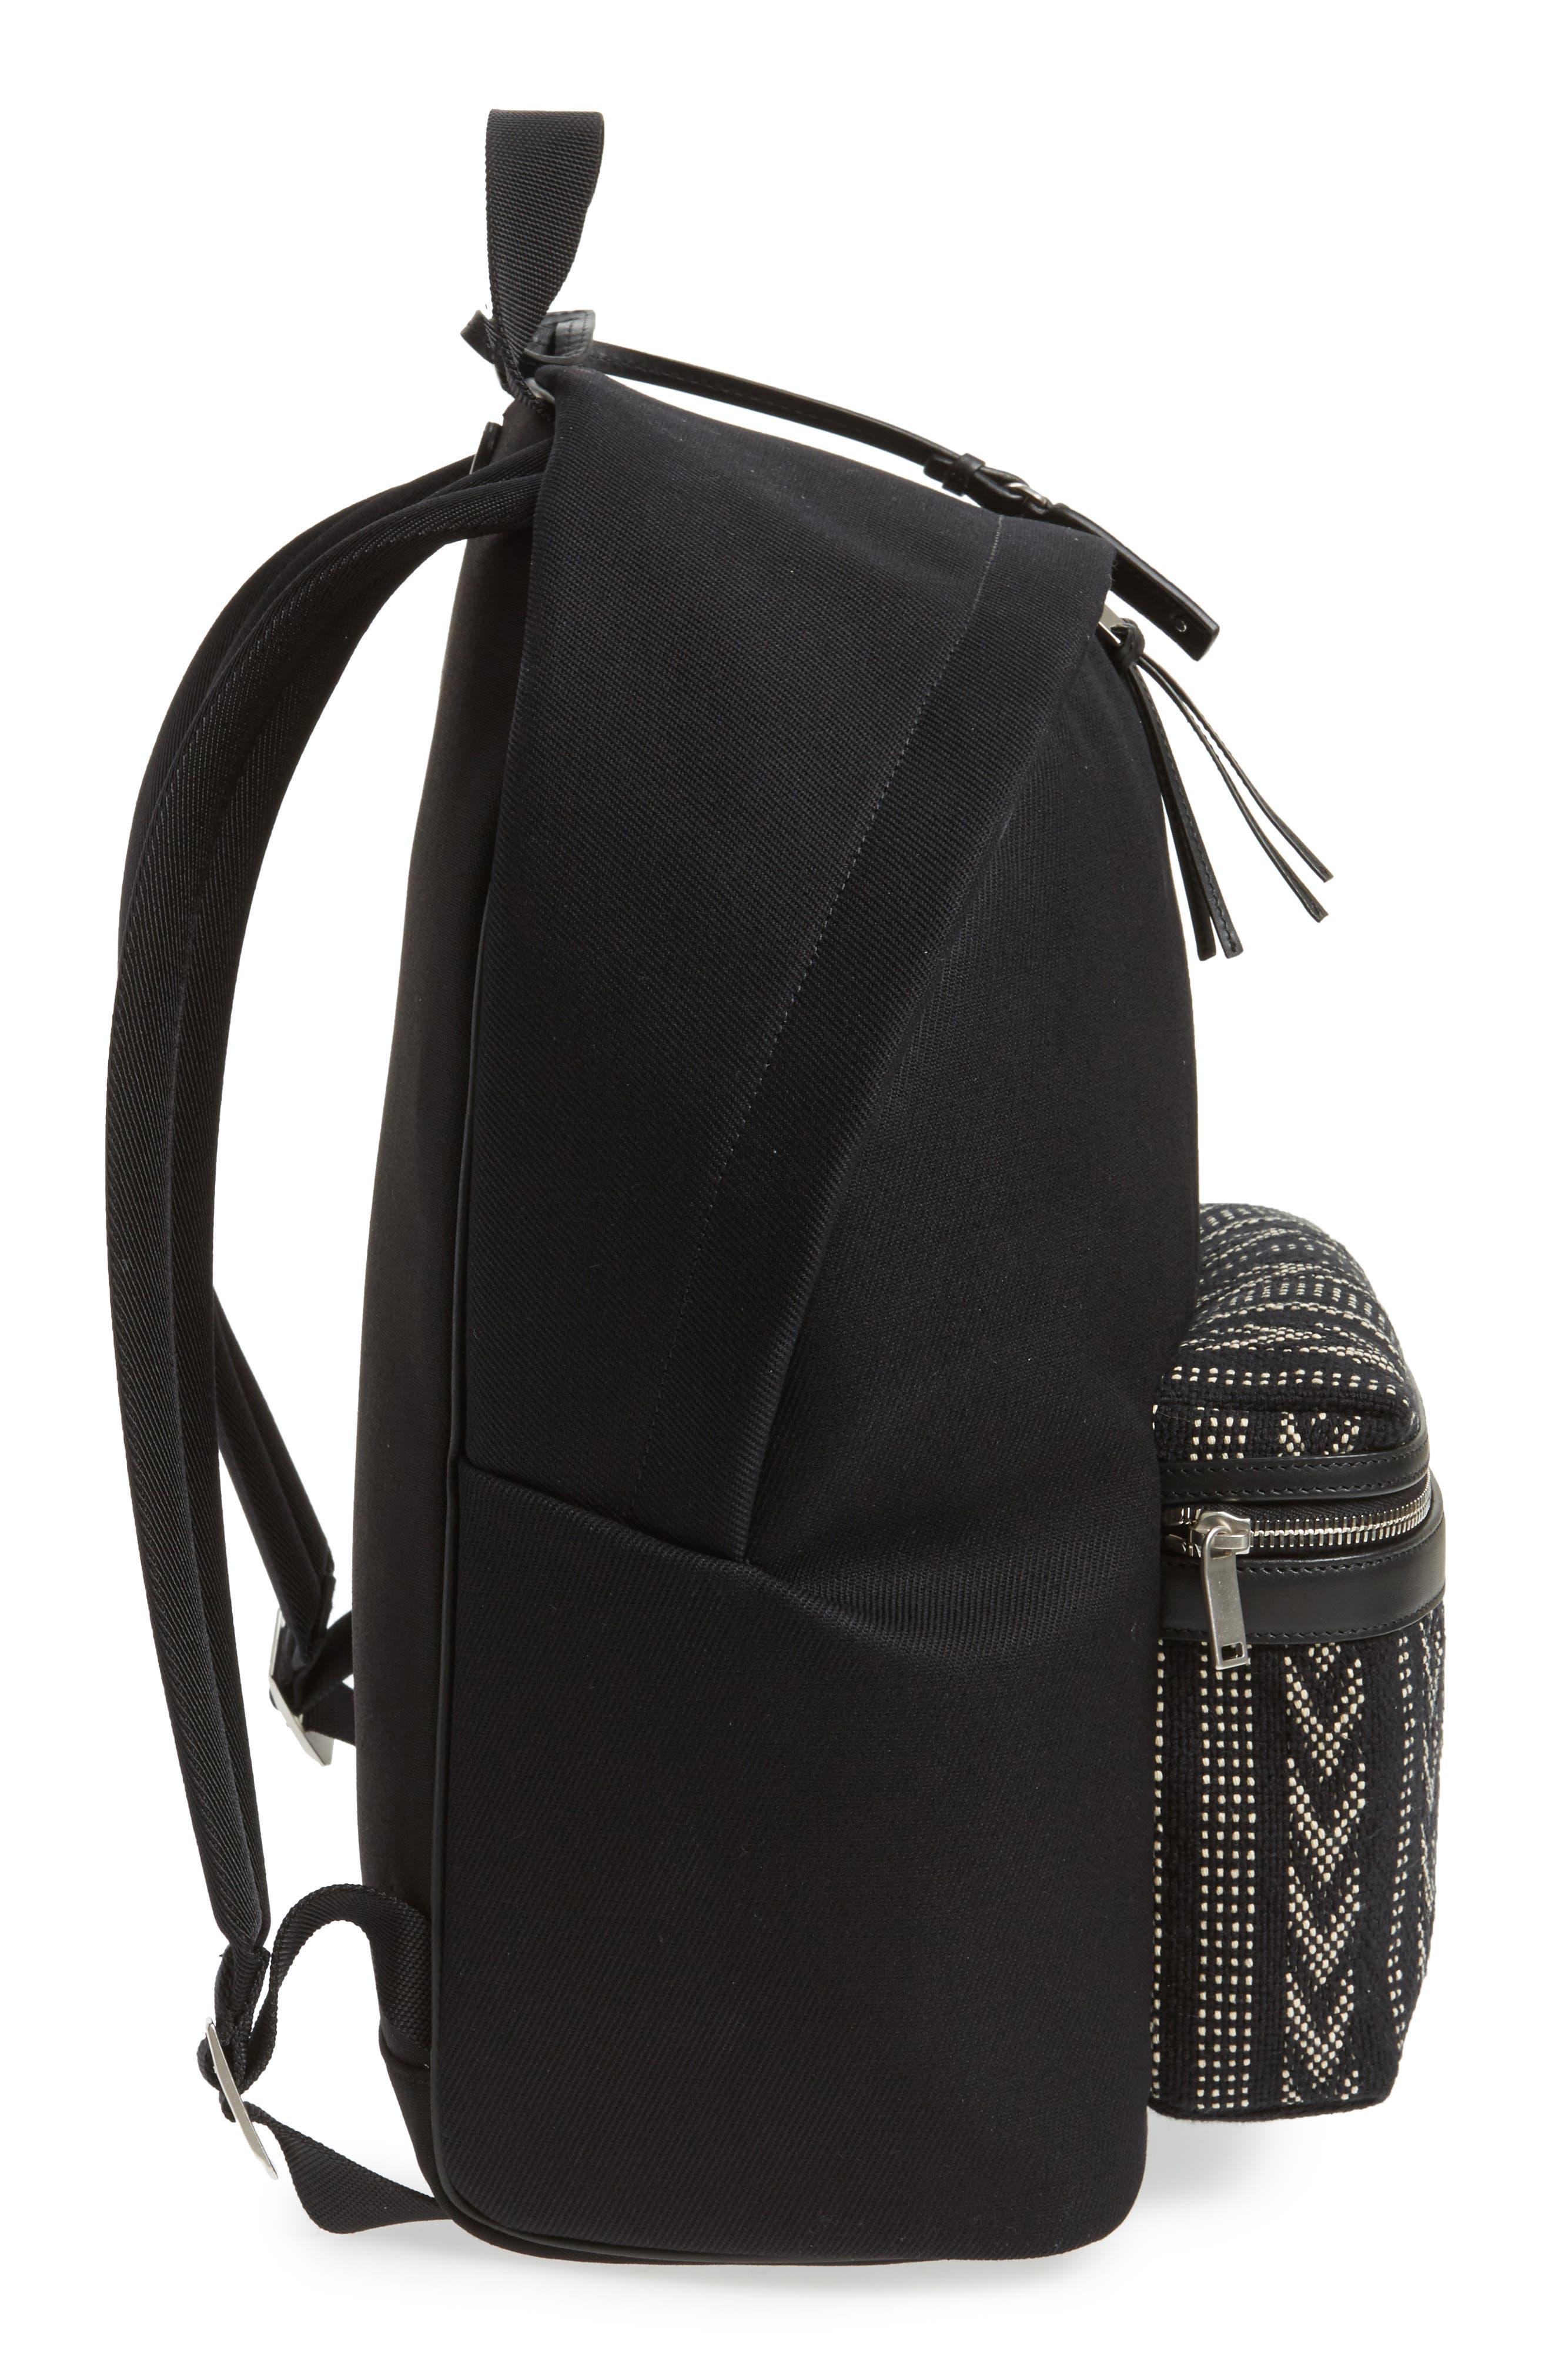 Pattern City Backpack,                             Alternate thumbnail 5, color,                             BLACK/ WHITE